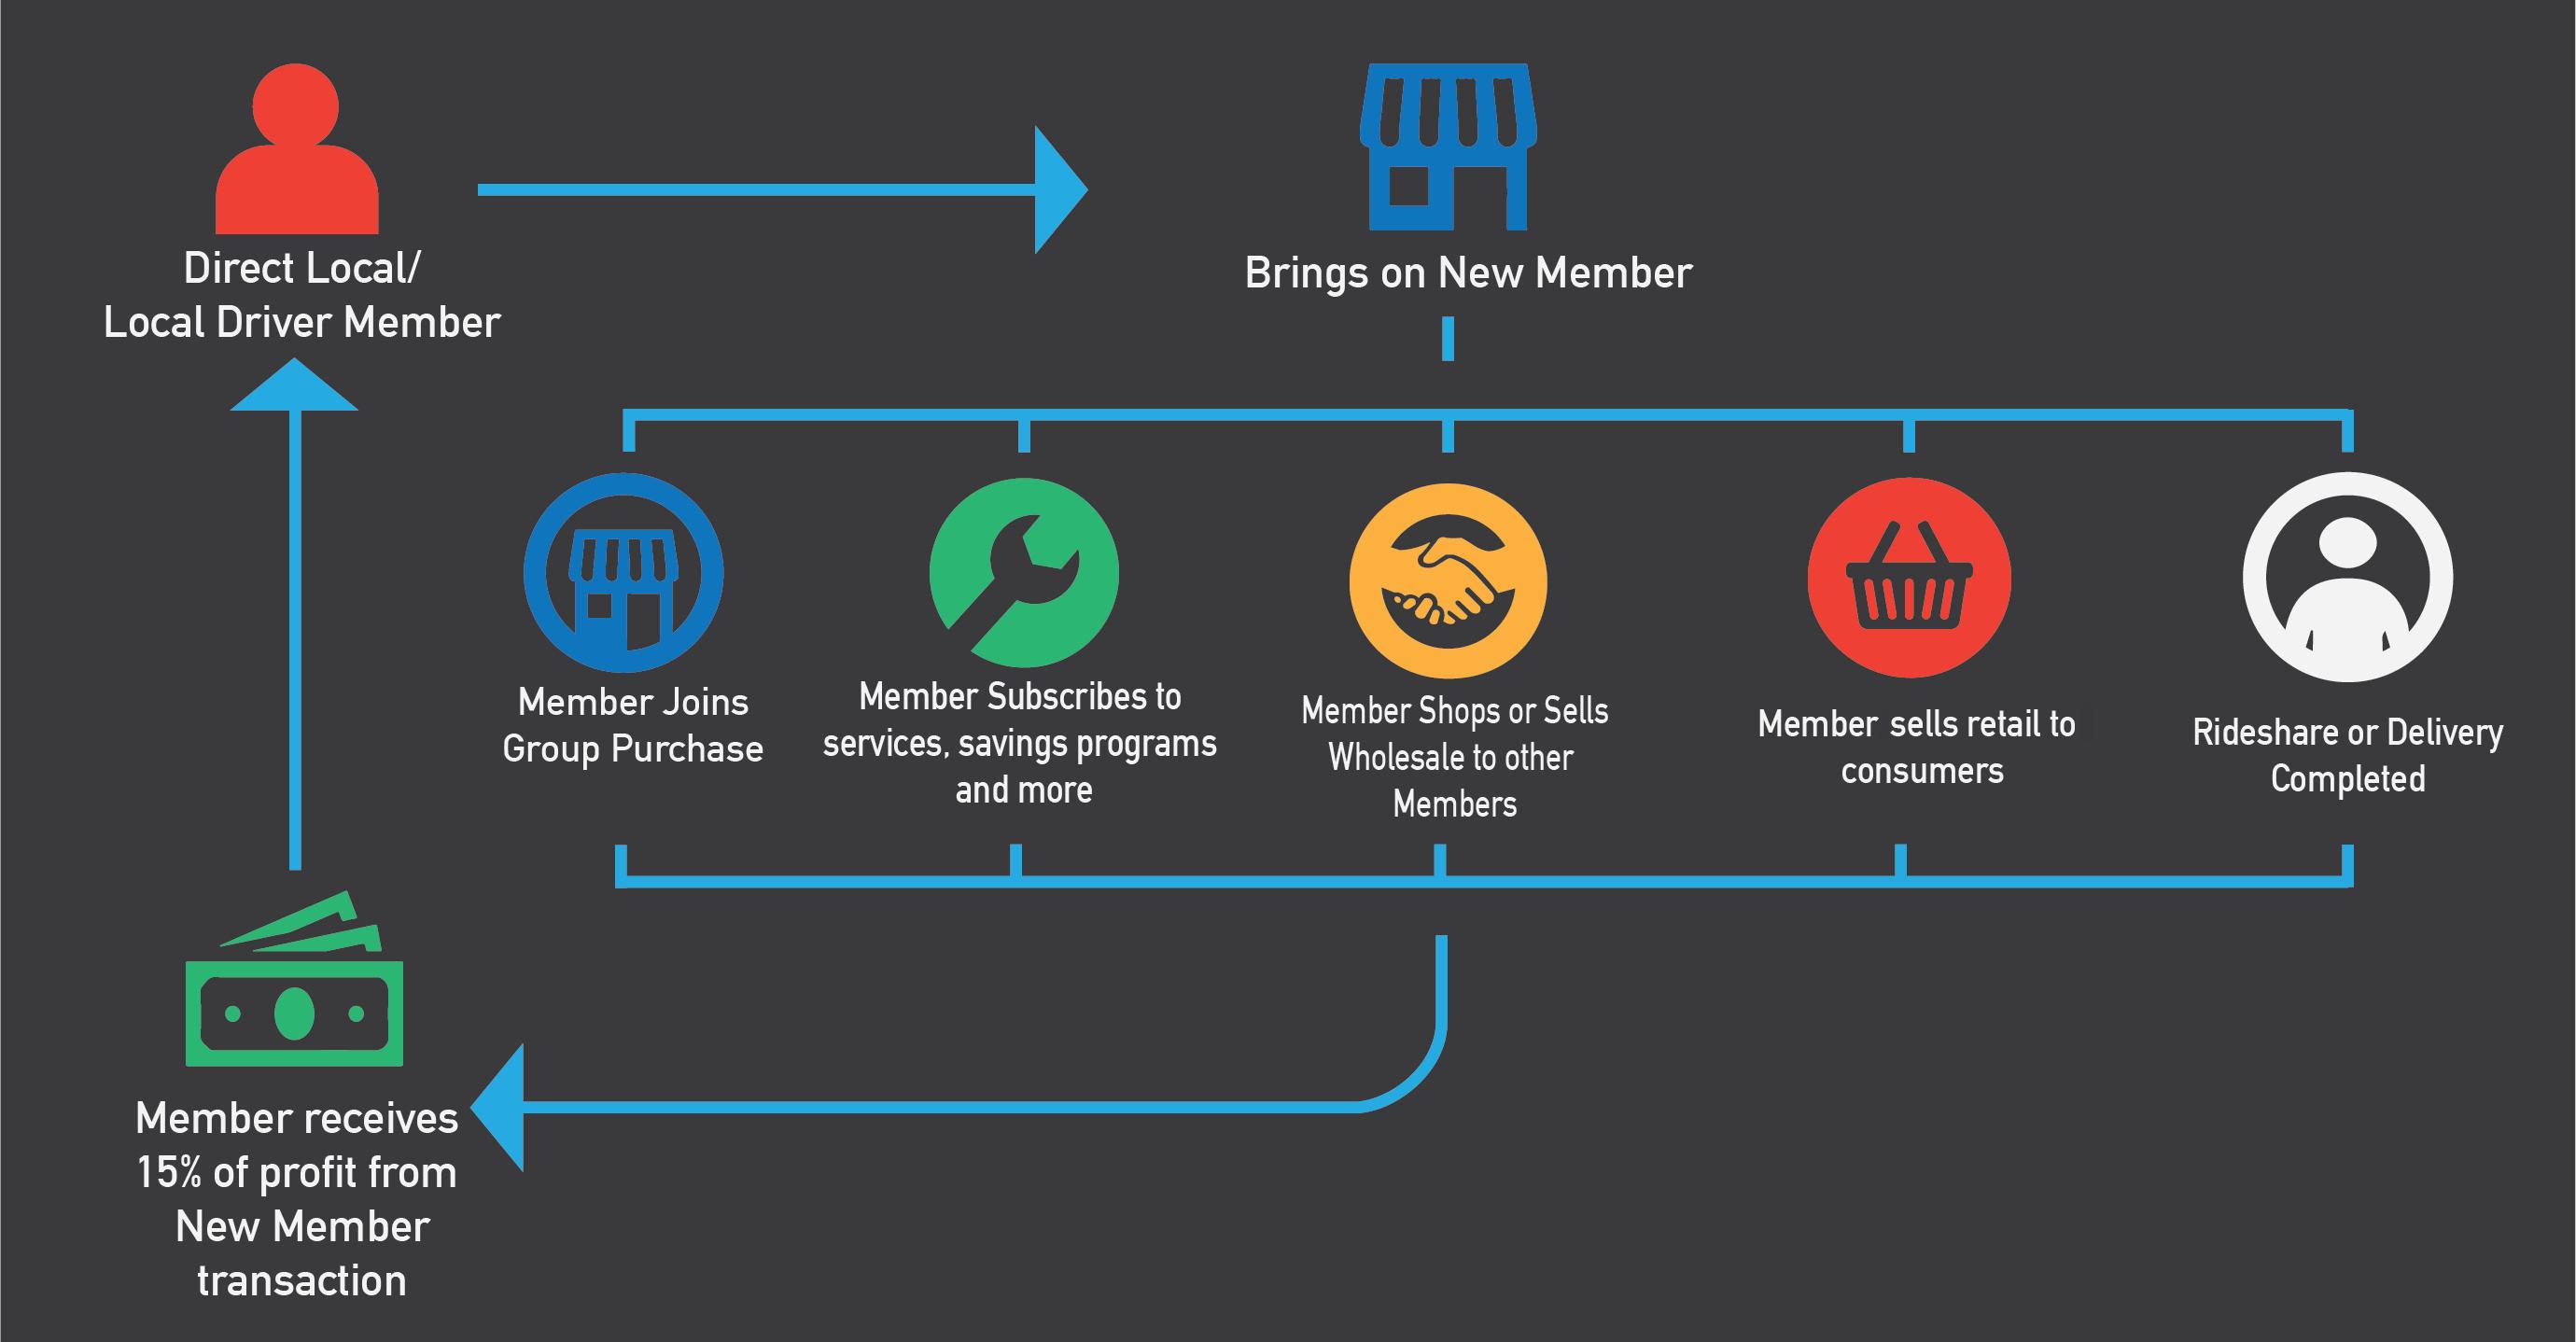 Direct Local/Local Driver Co-op Member Partnership Program